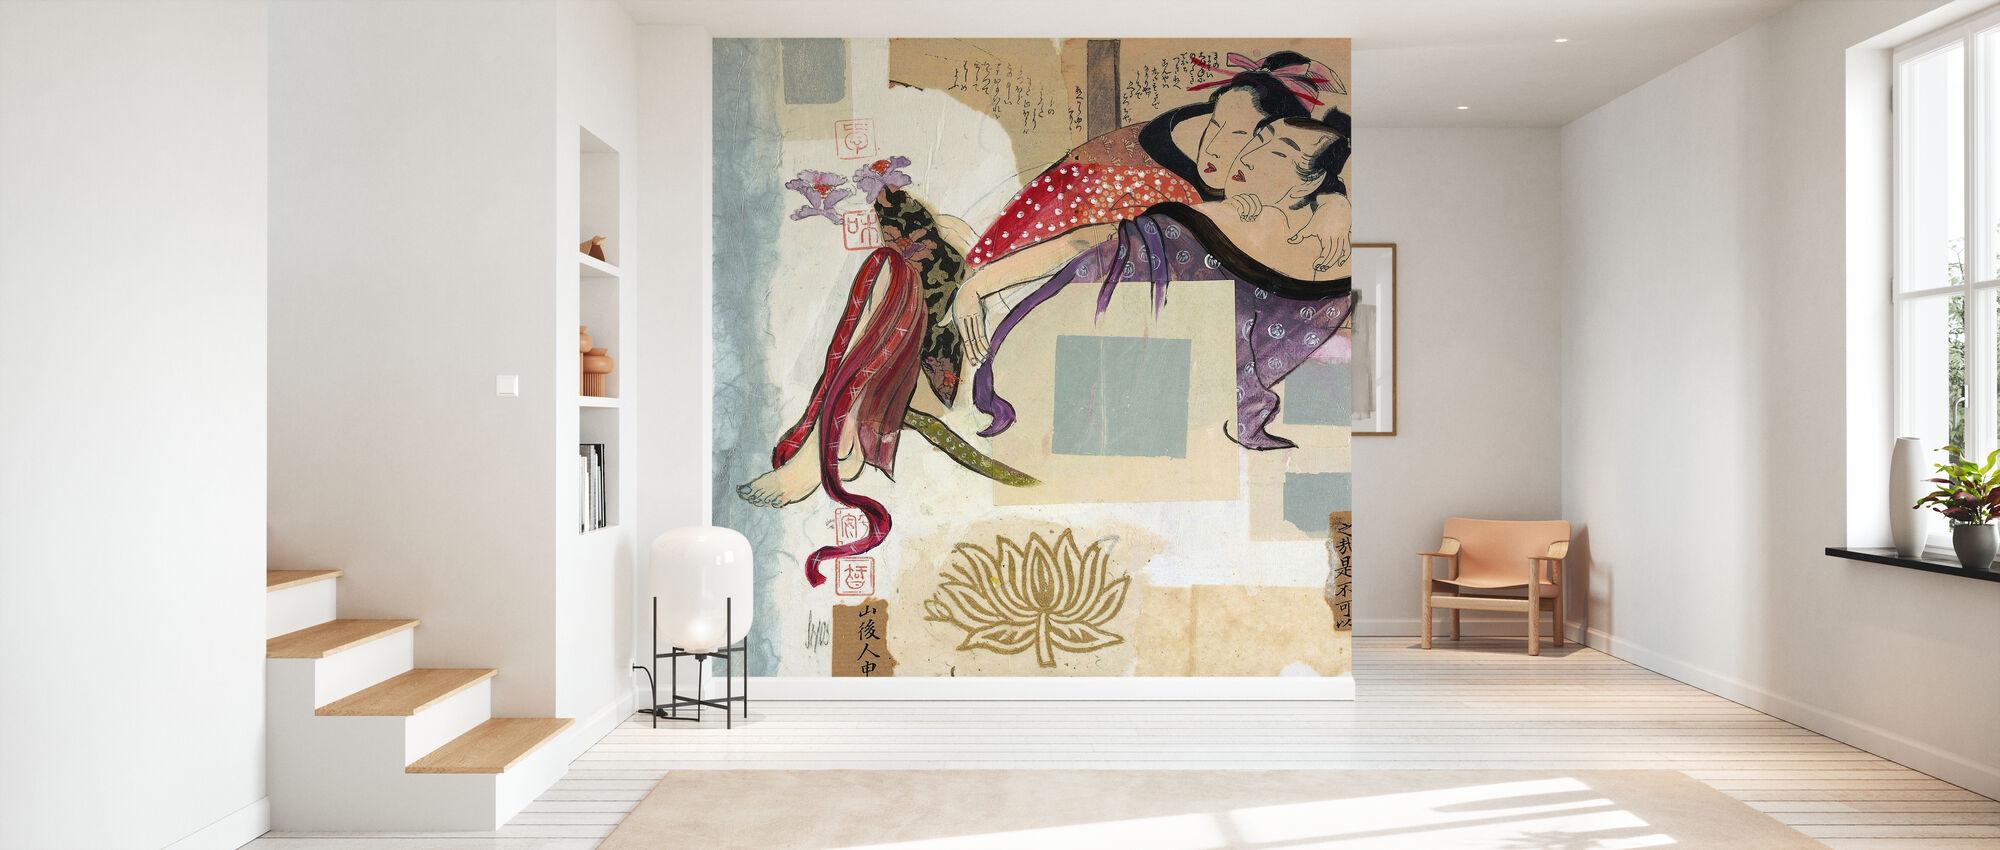 Touch - Wallpaper - Hallway